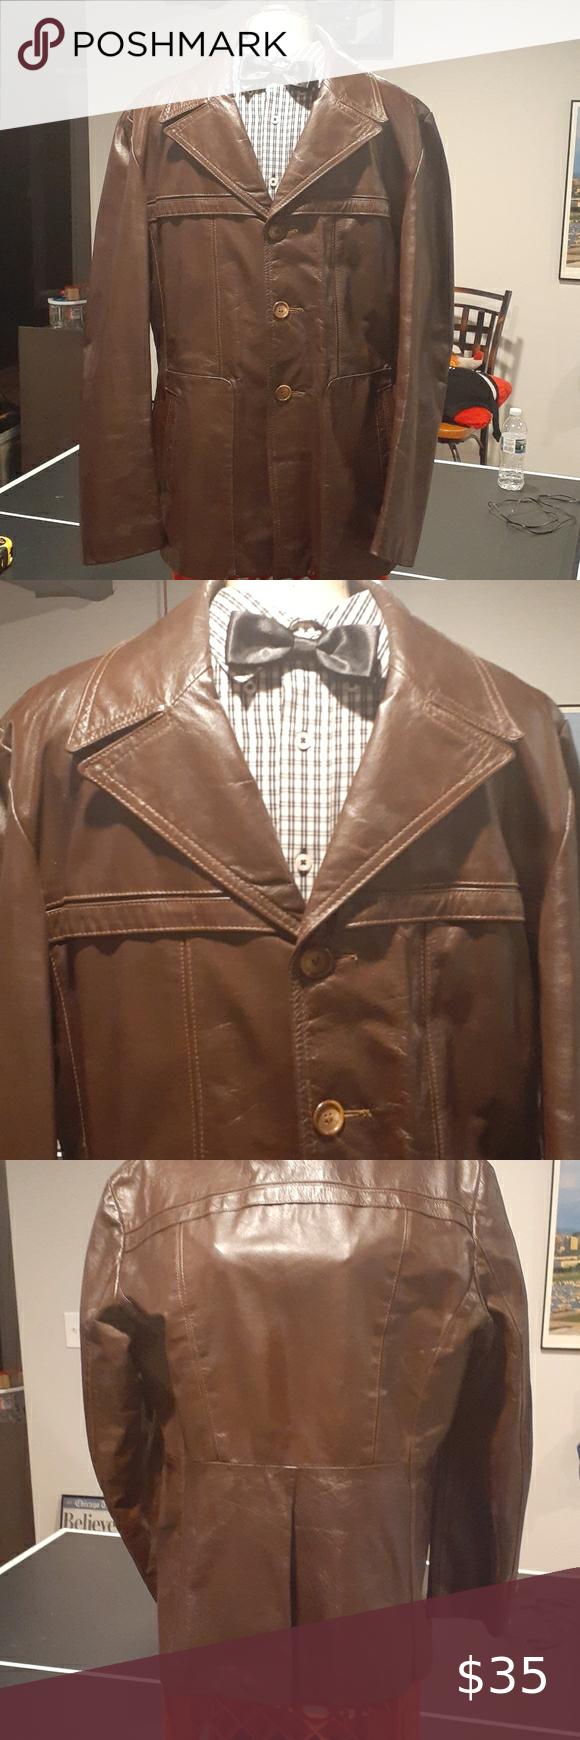 Men Brown Leather Coat M Brown Leather Coat Leather Coat Plaid Fashion [ 1740 x 580 Pixel ]